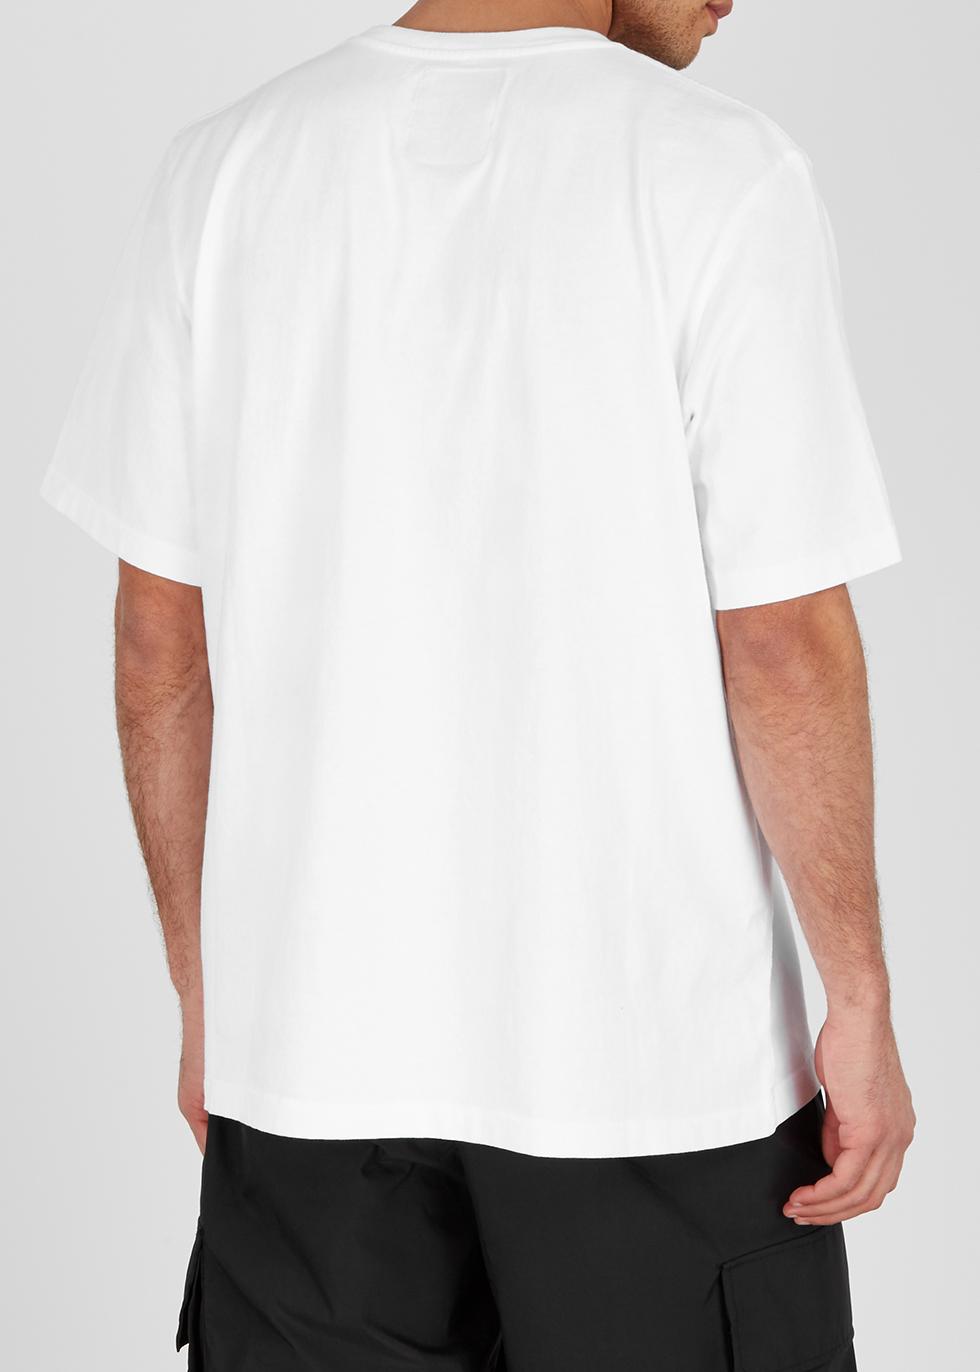 White oversized cotton T-shirt - Last Heavy